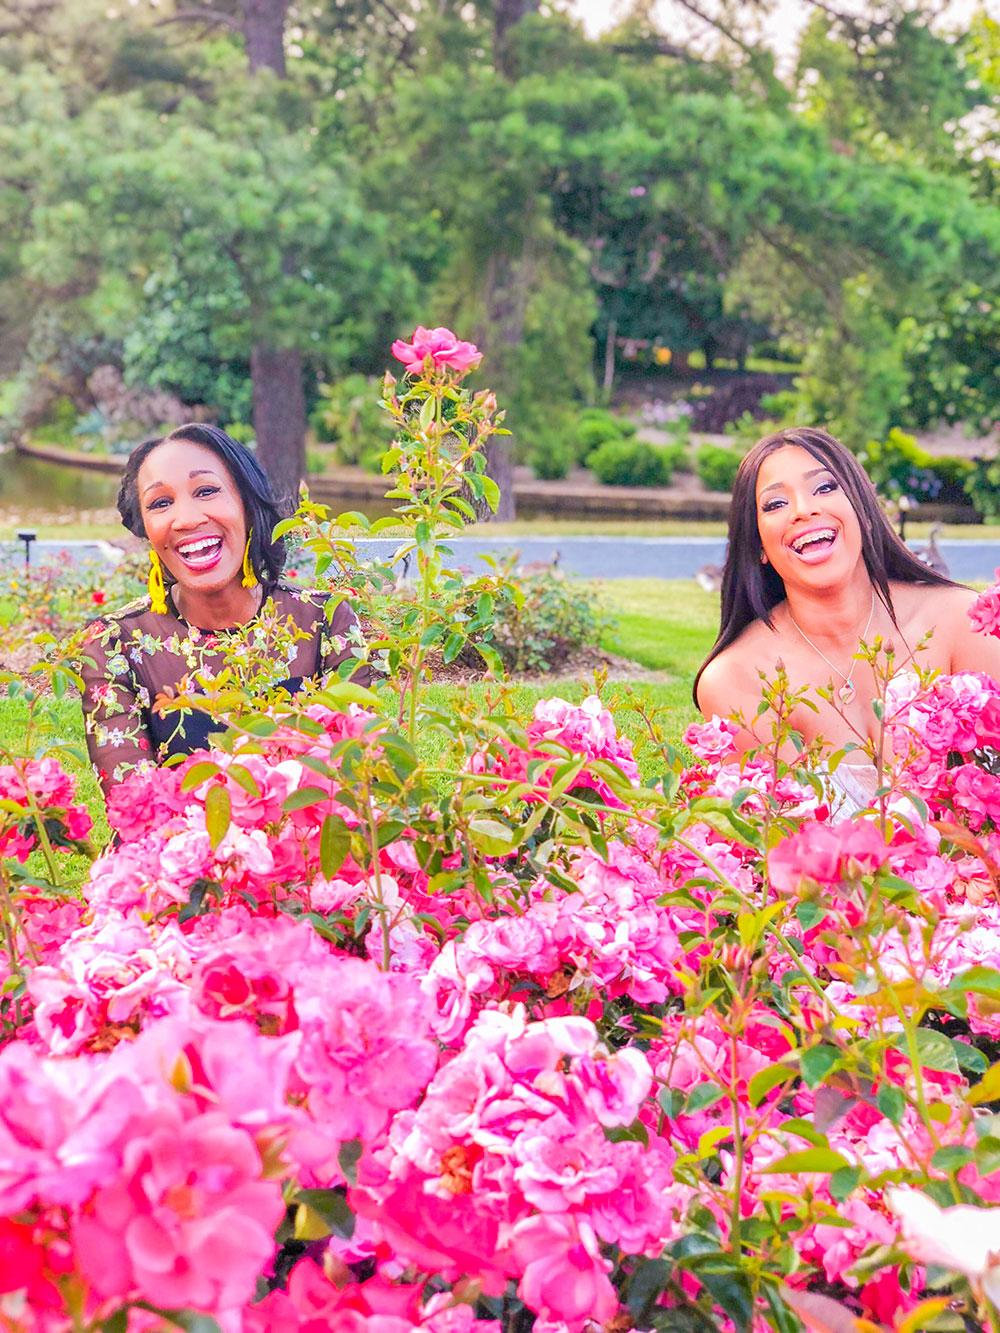 shaunda necole norfolk botanical garden rose garden